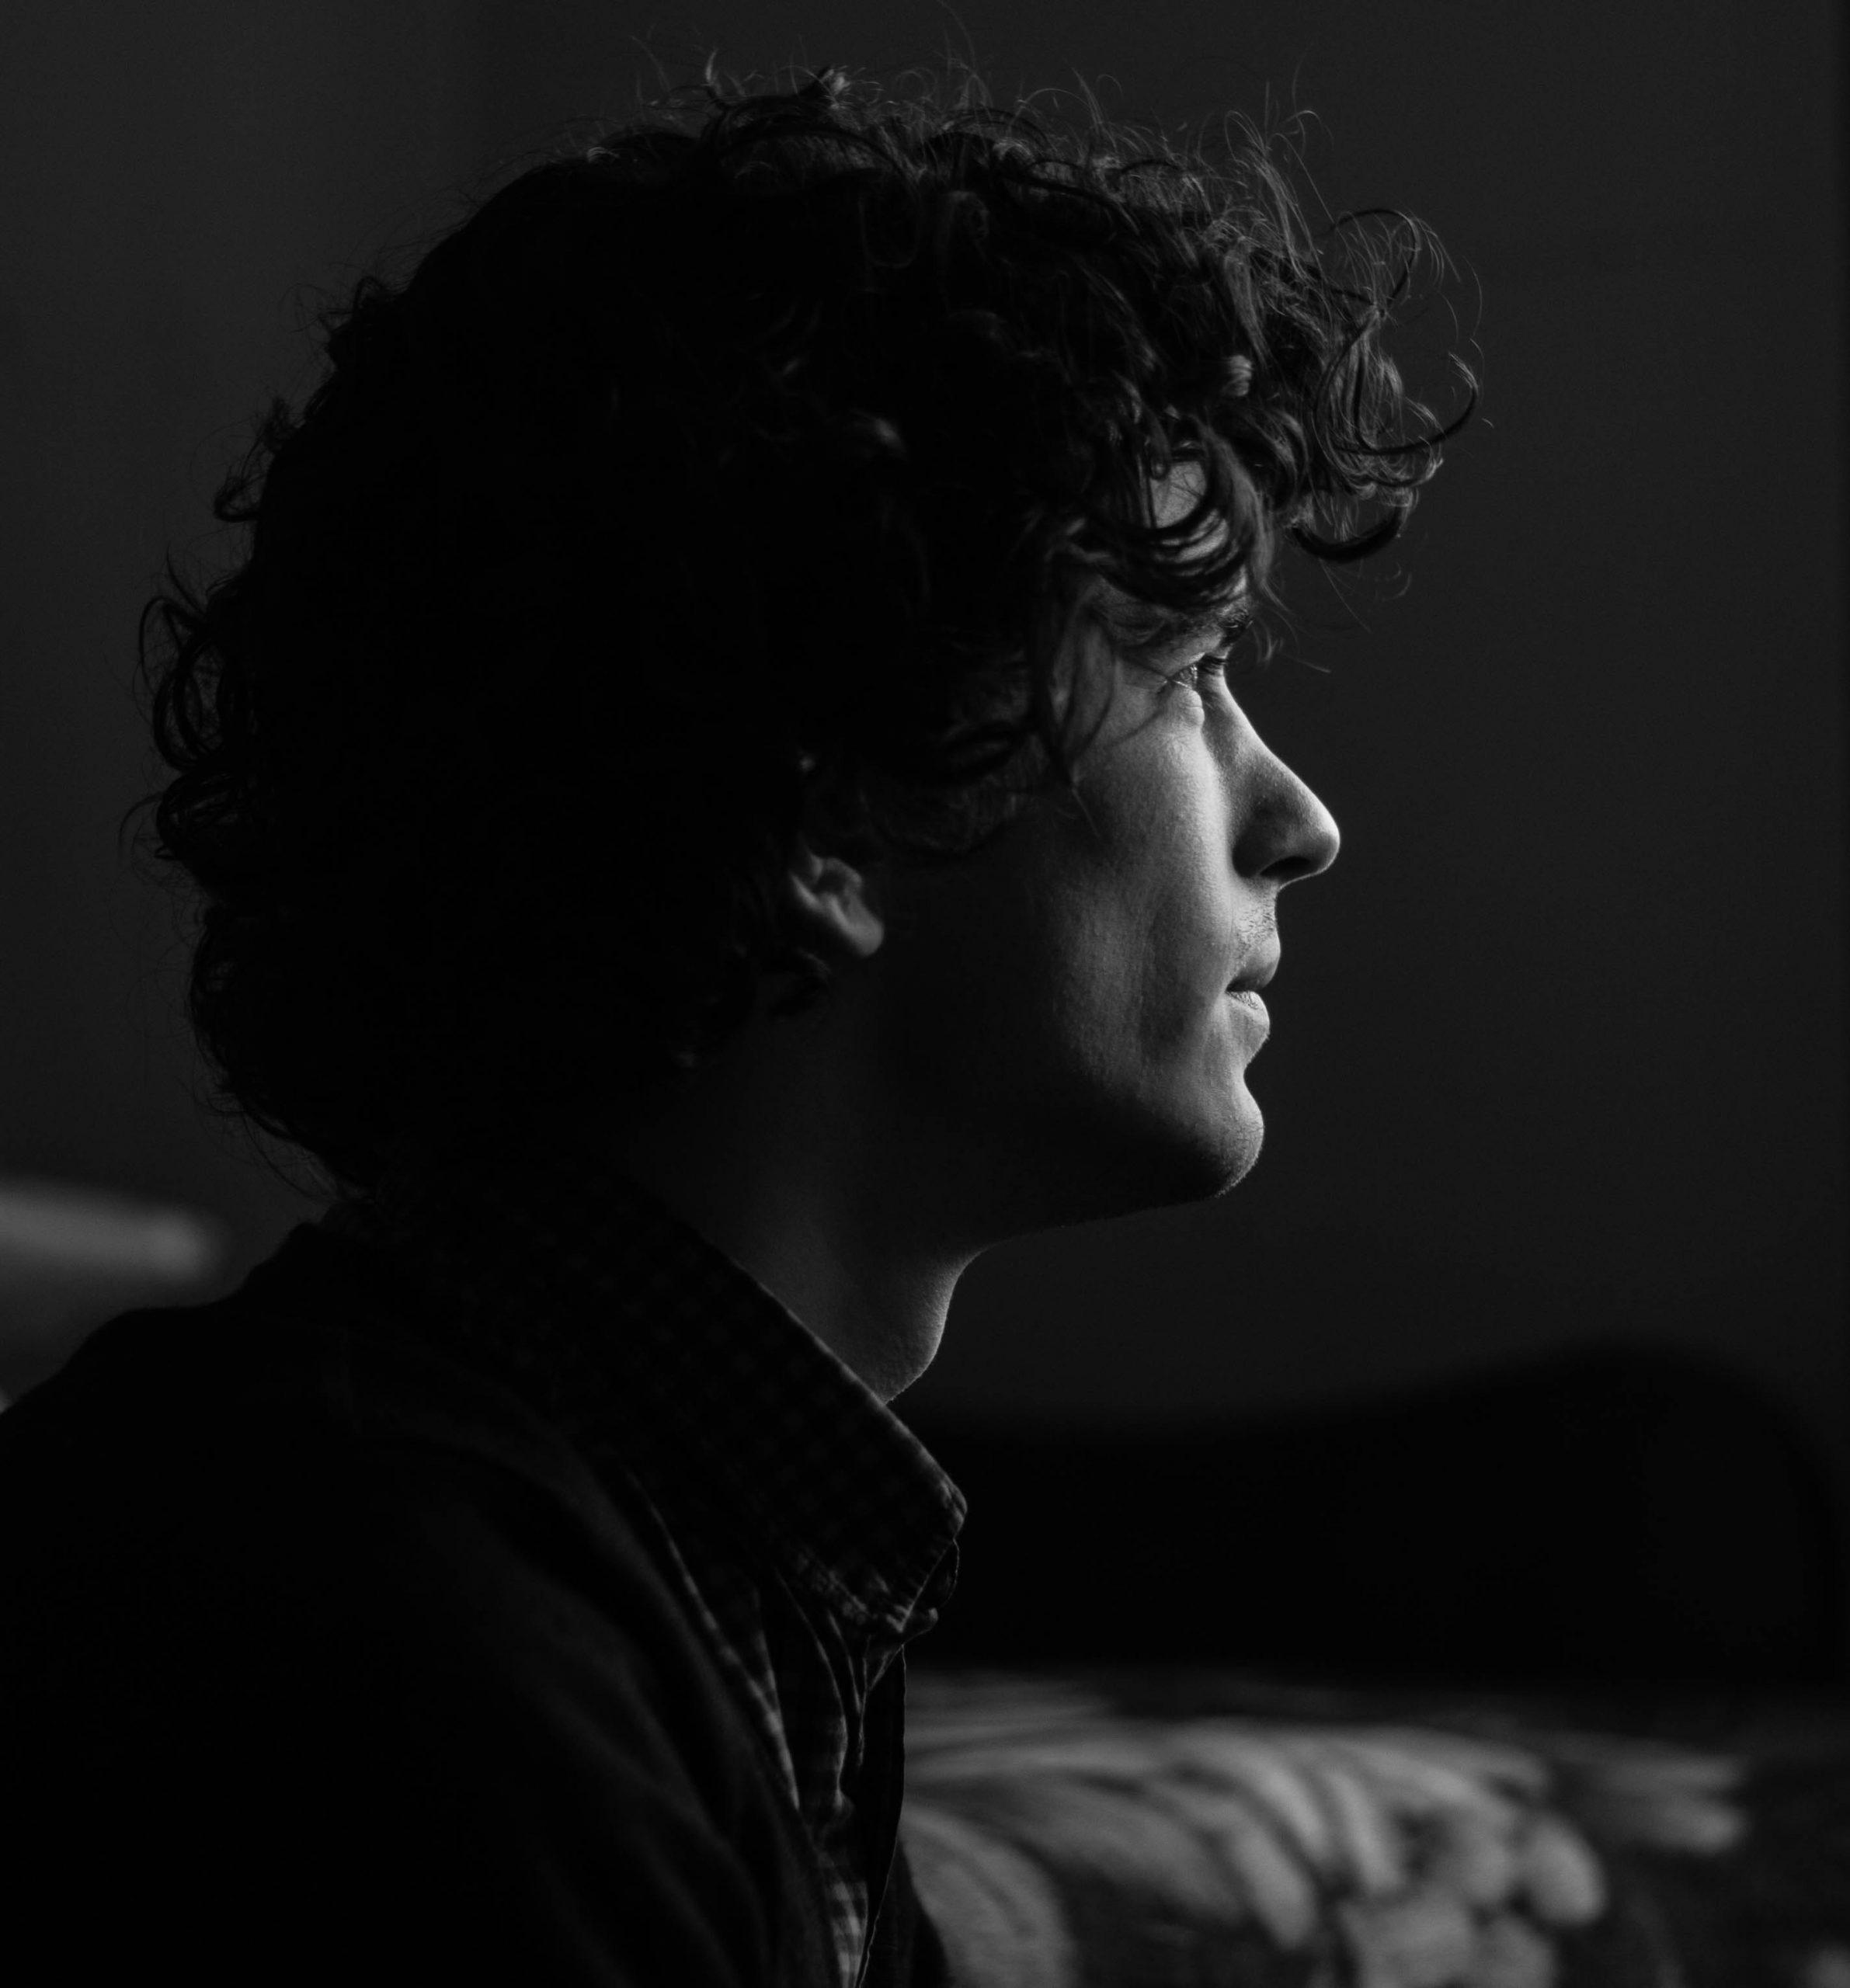 light-black-and-white-portrait-canon-60778